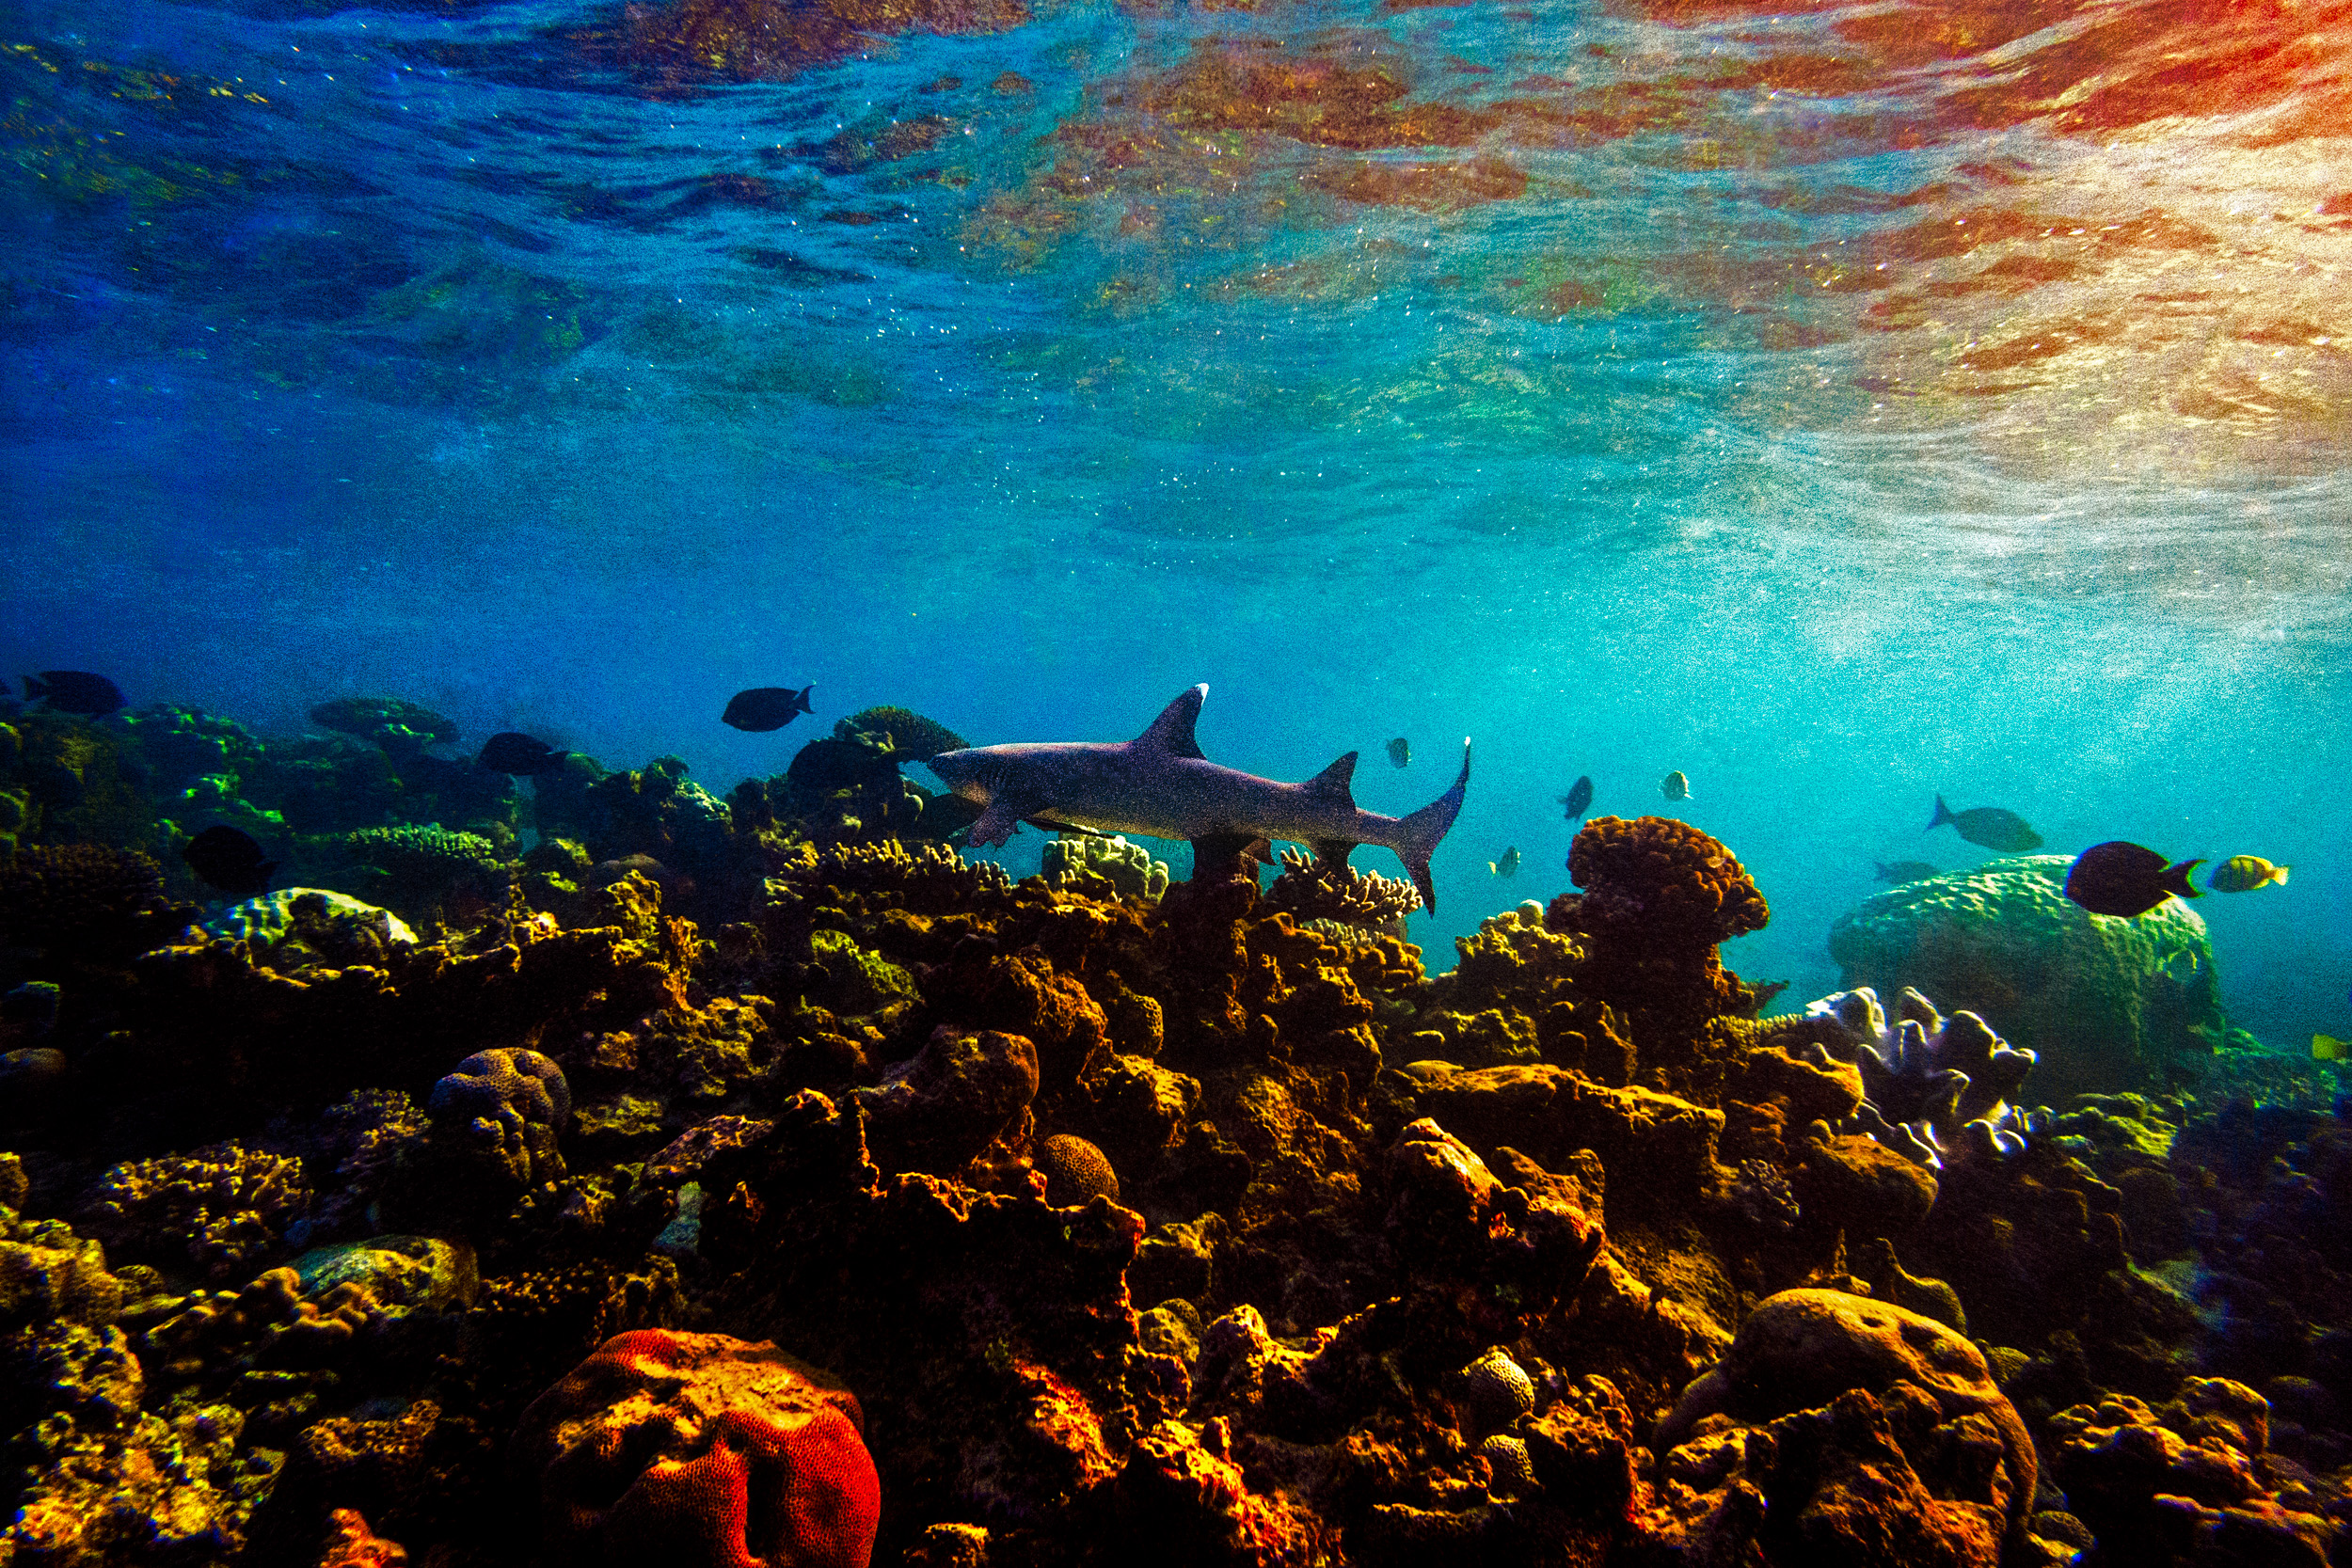 Spyrides_Kyle_Ningaloo_Reef_Sal_Salis.13.5.2016Spyrides_Kyle_White_Reef_Swimming_Over_Coral_colors_1_P5131897.jpg